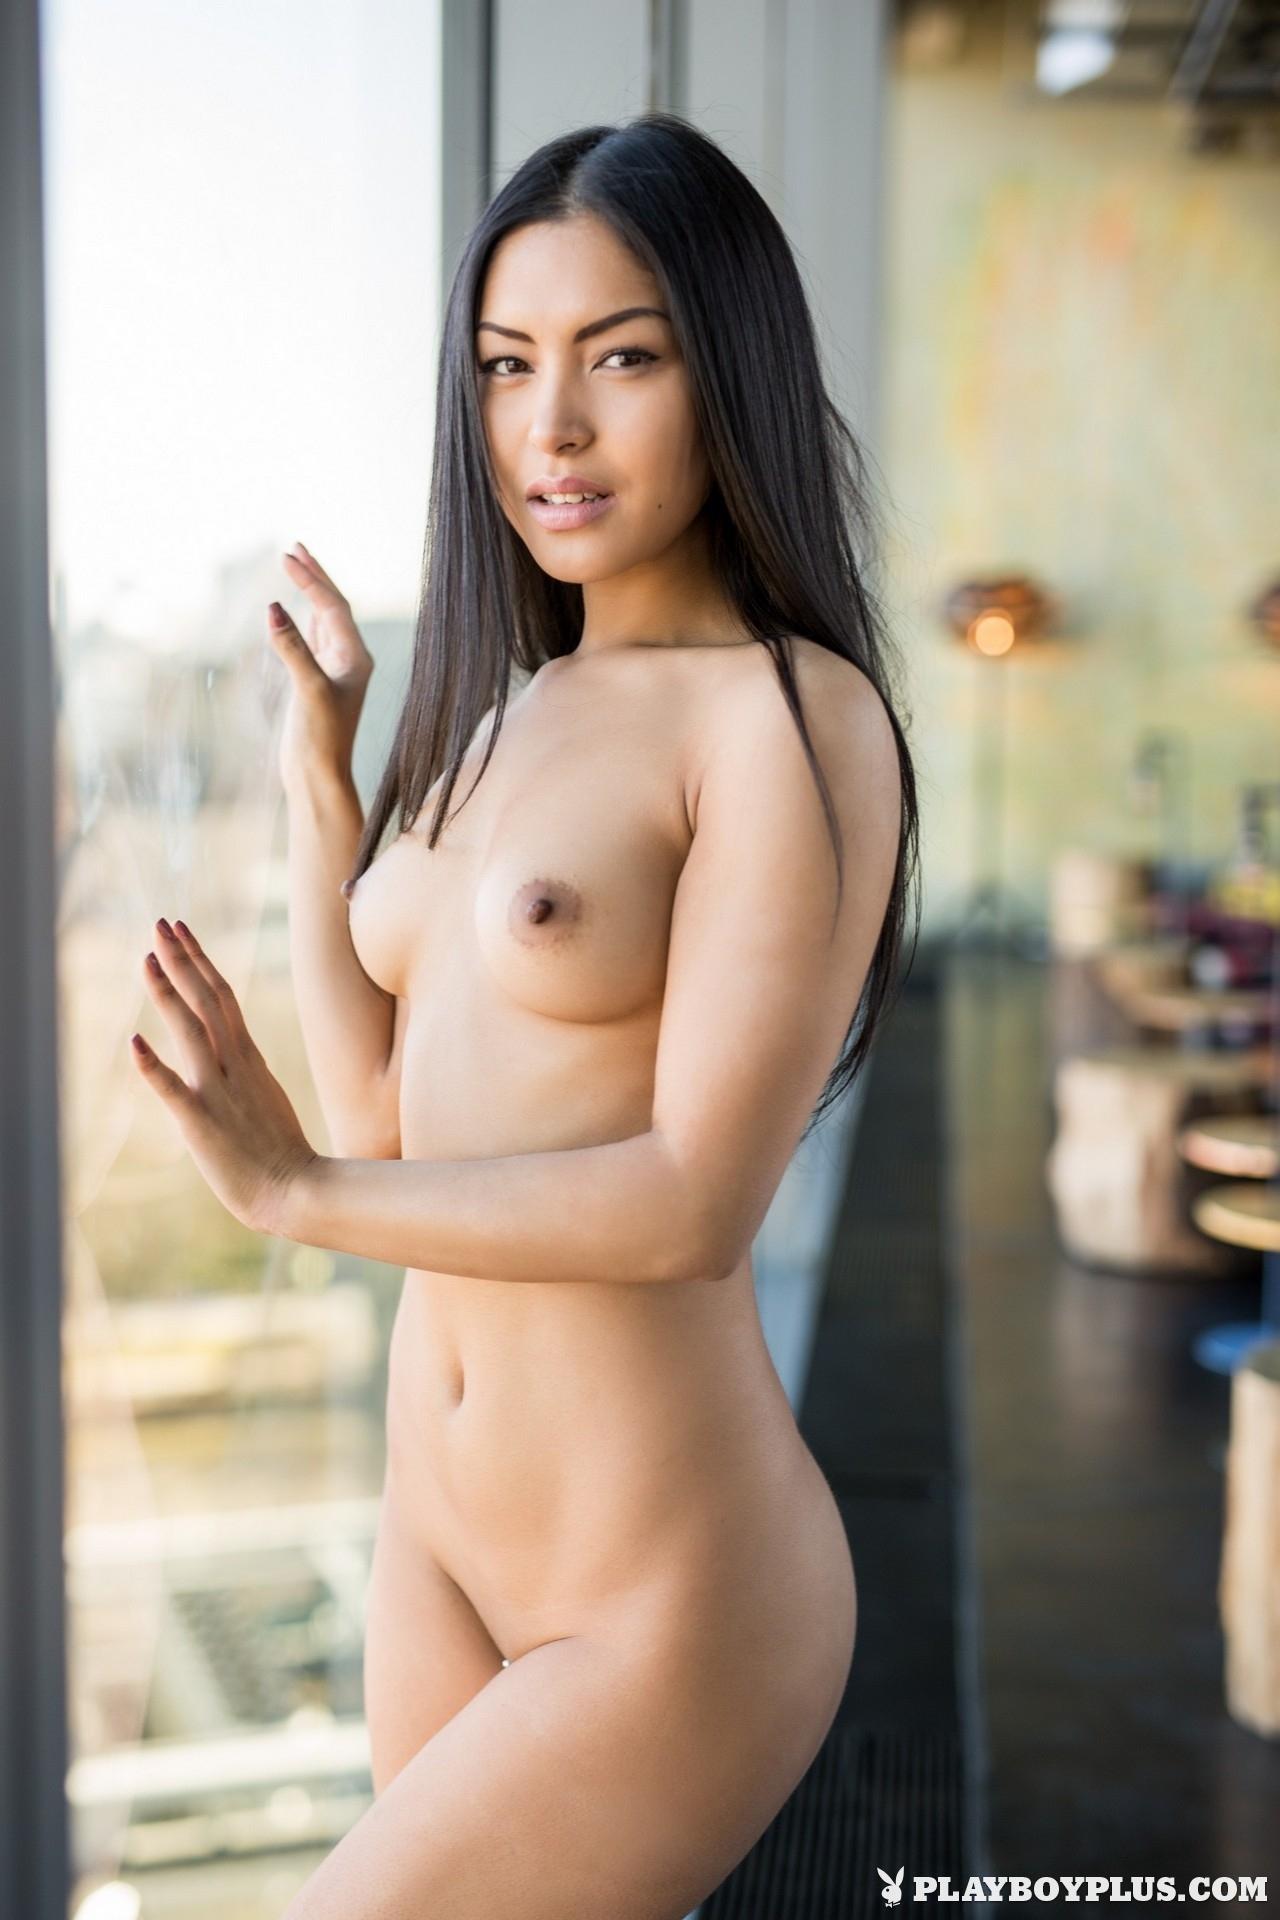 Playboy Plus Chloe Rose In Inspiring View (5)